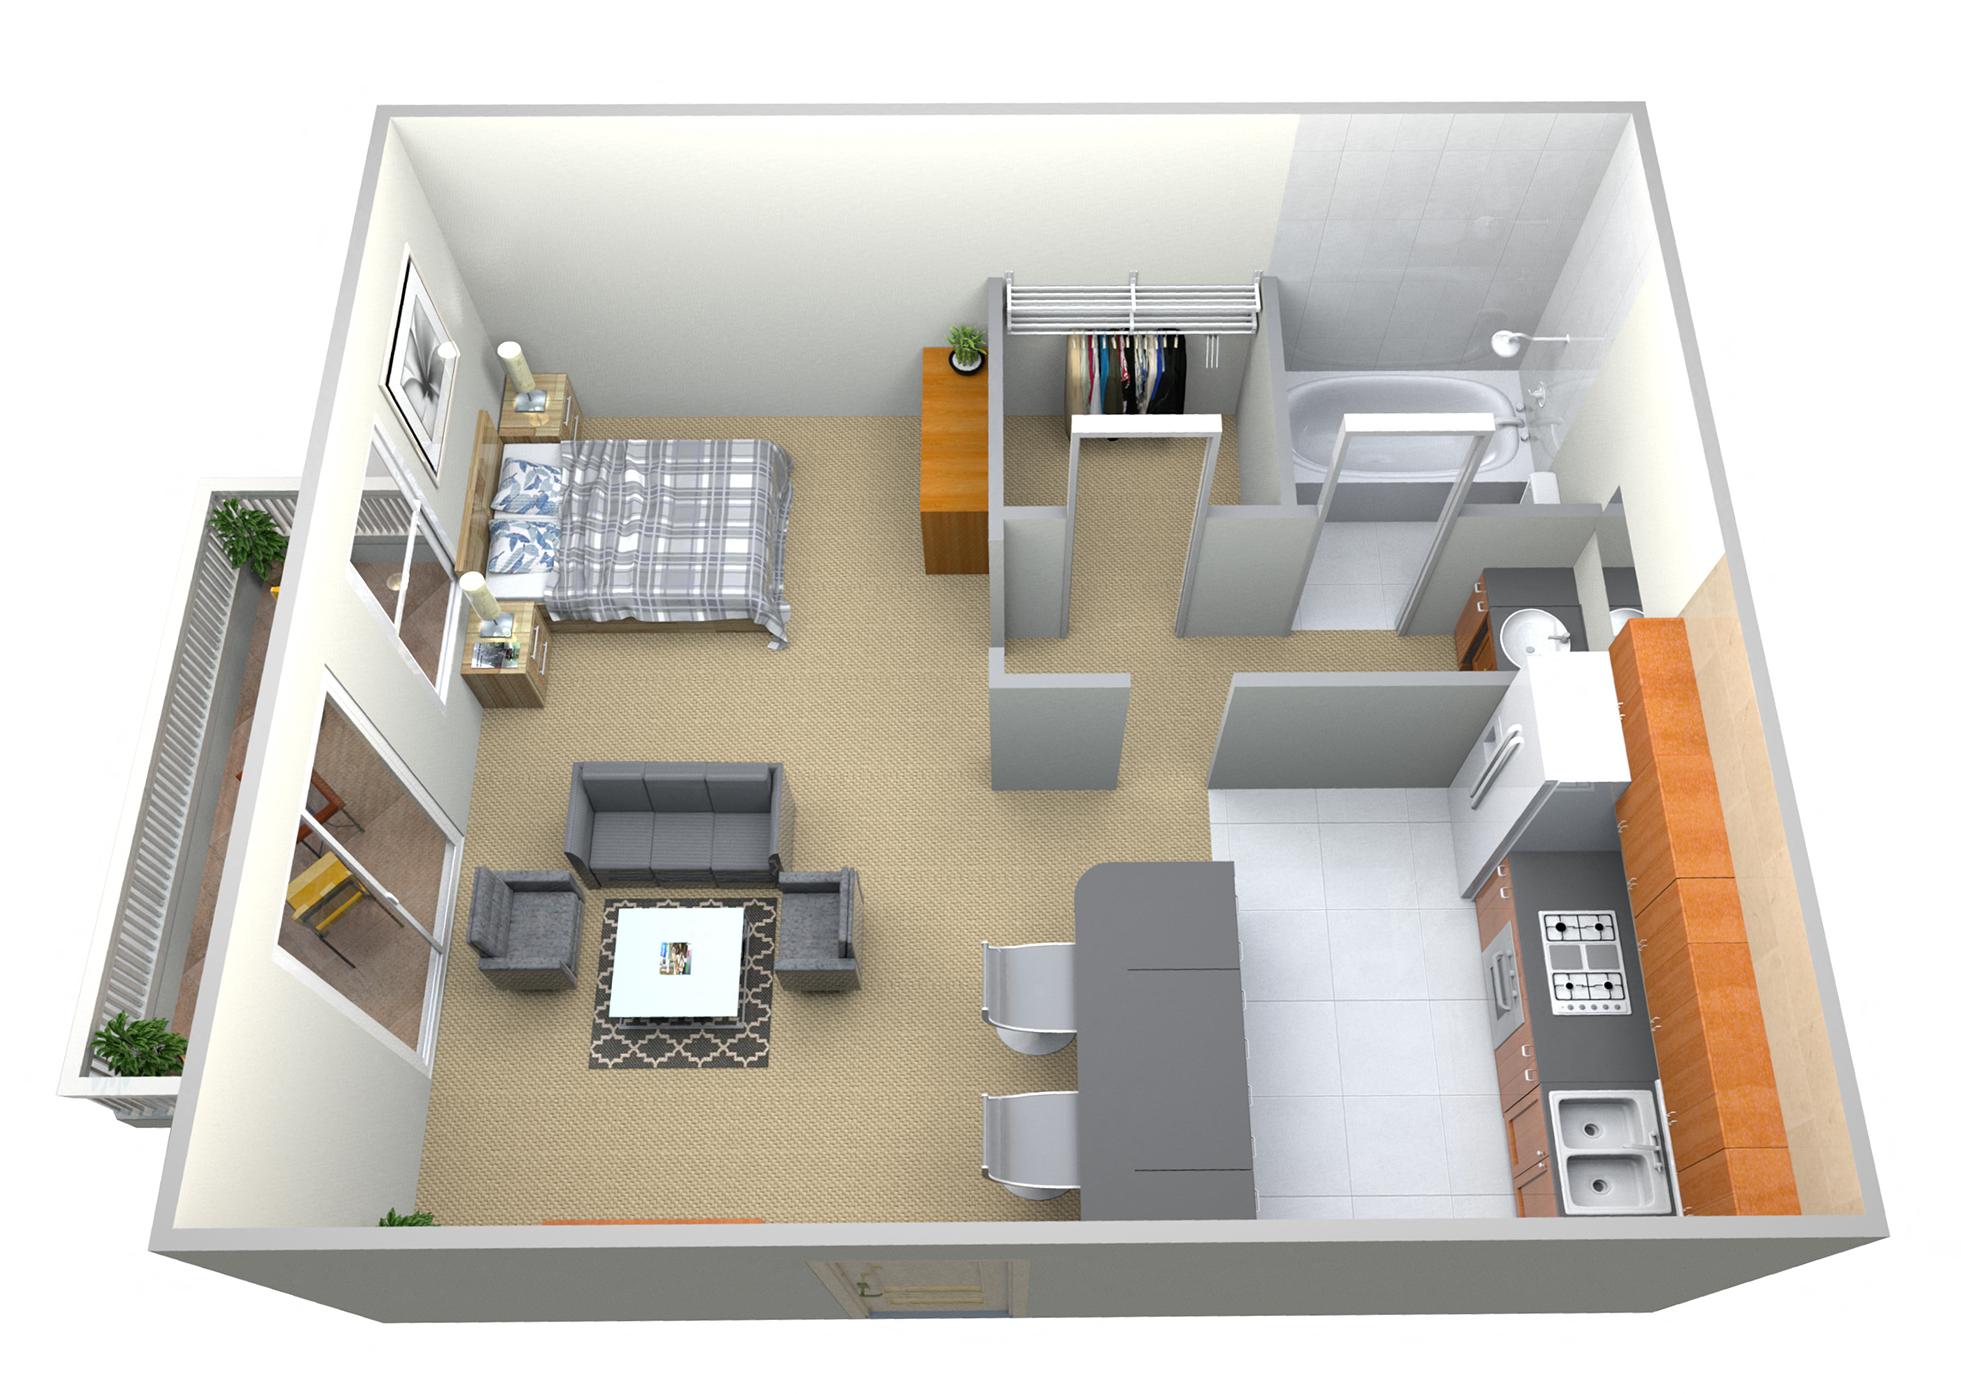 Lakeview Apartments 1Bed 1Bath 545Sqft Rev1